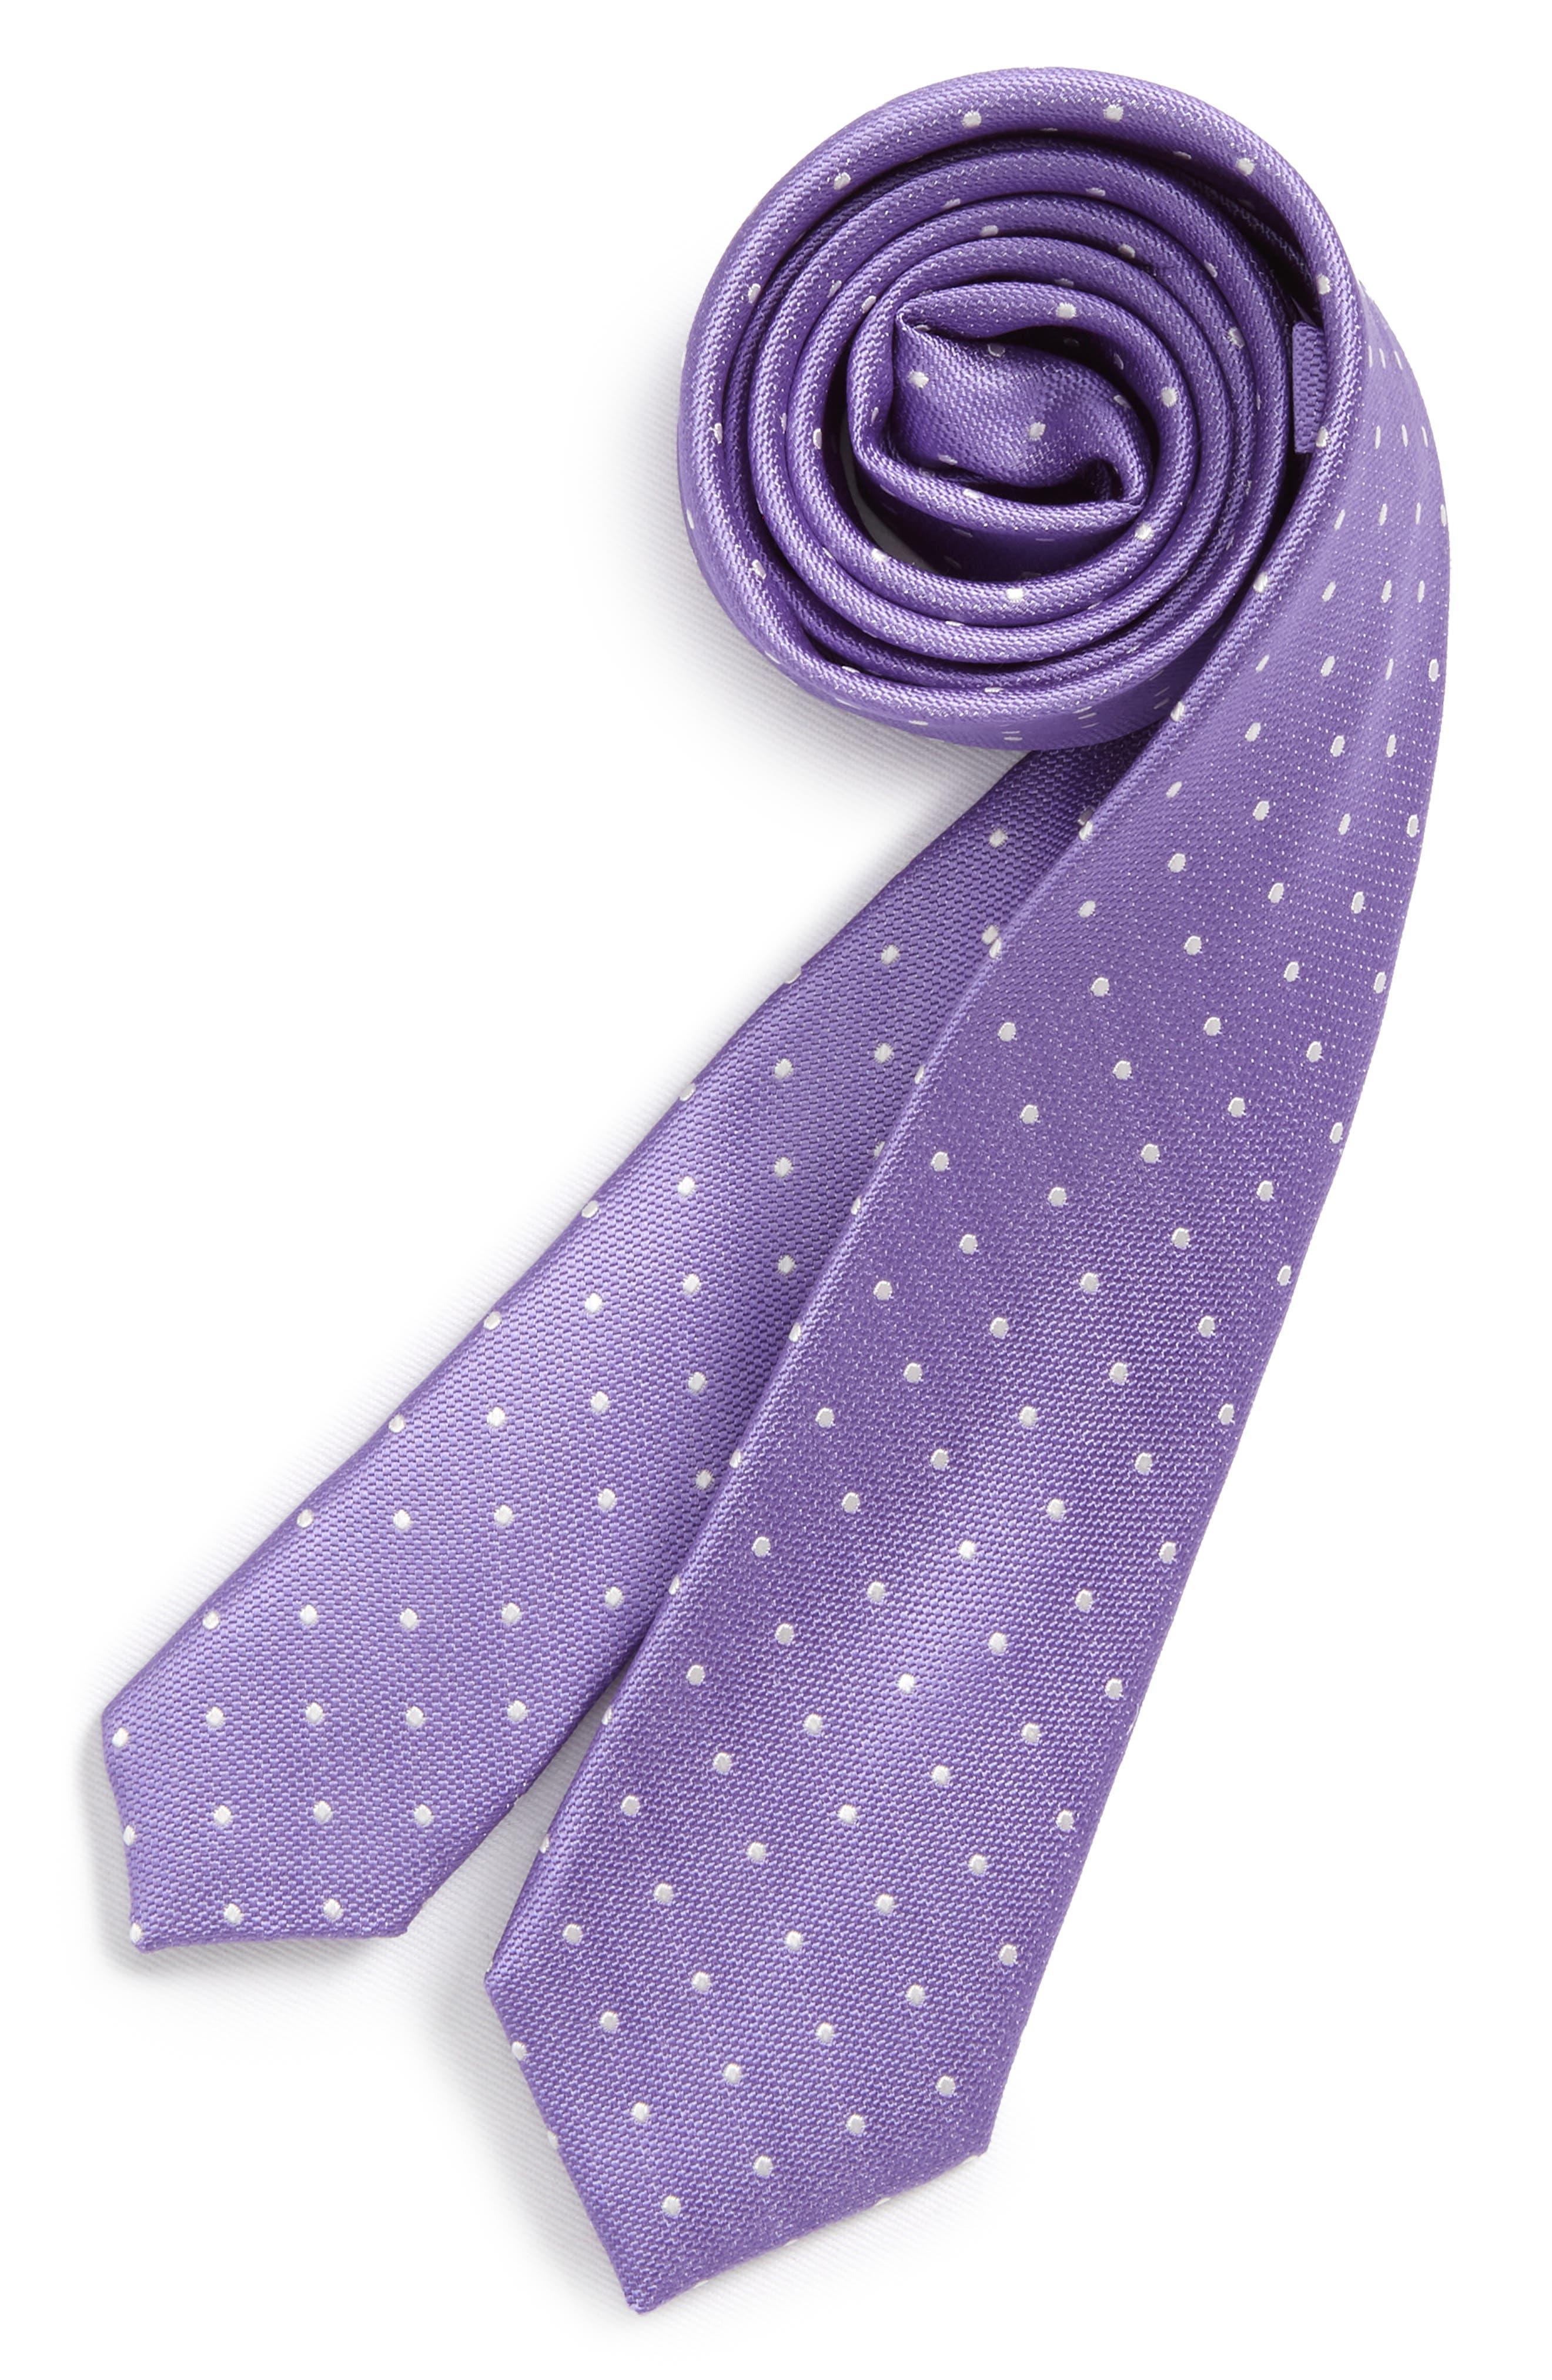 Dainty Dot Silk Tie,                             Main thumbnail 1, color,                             500